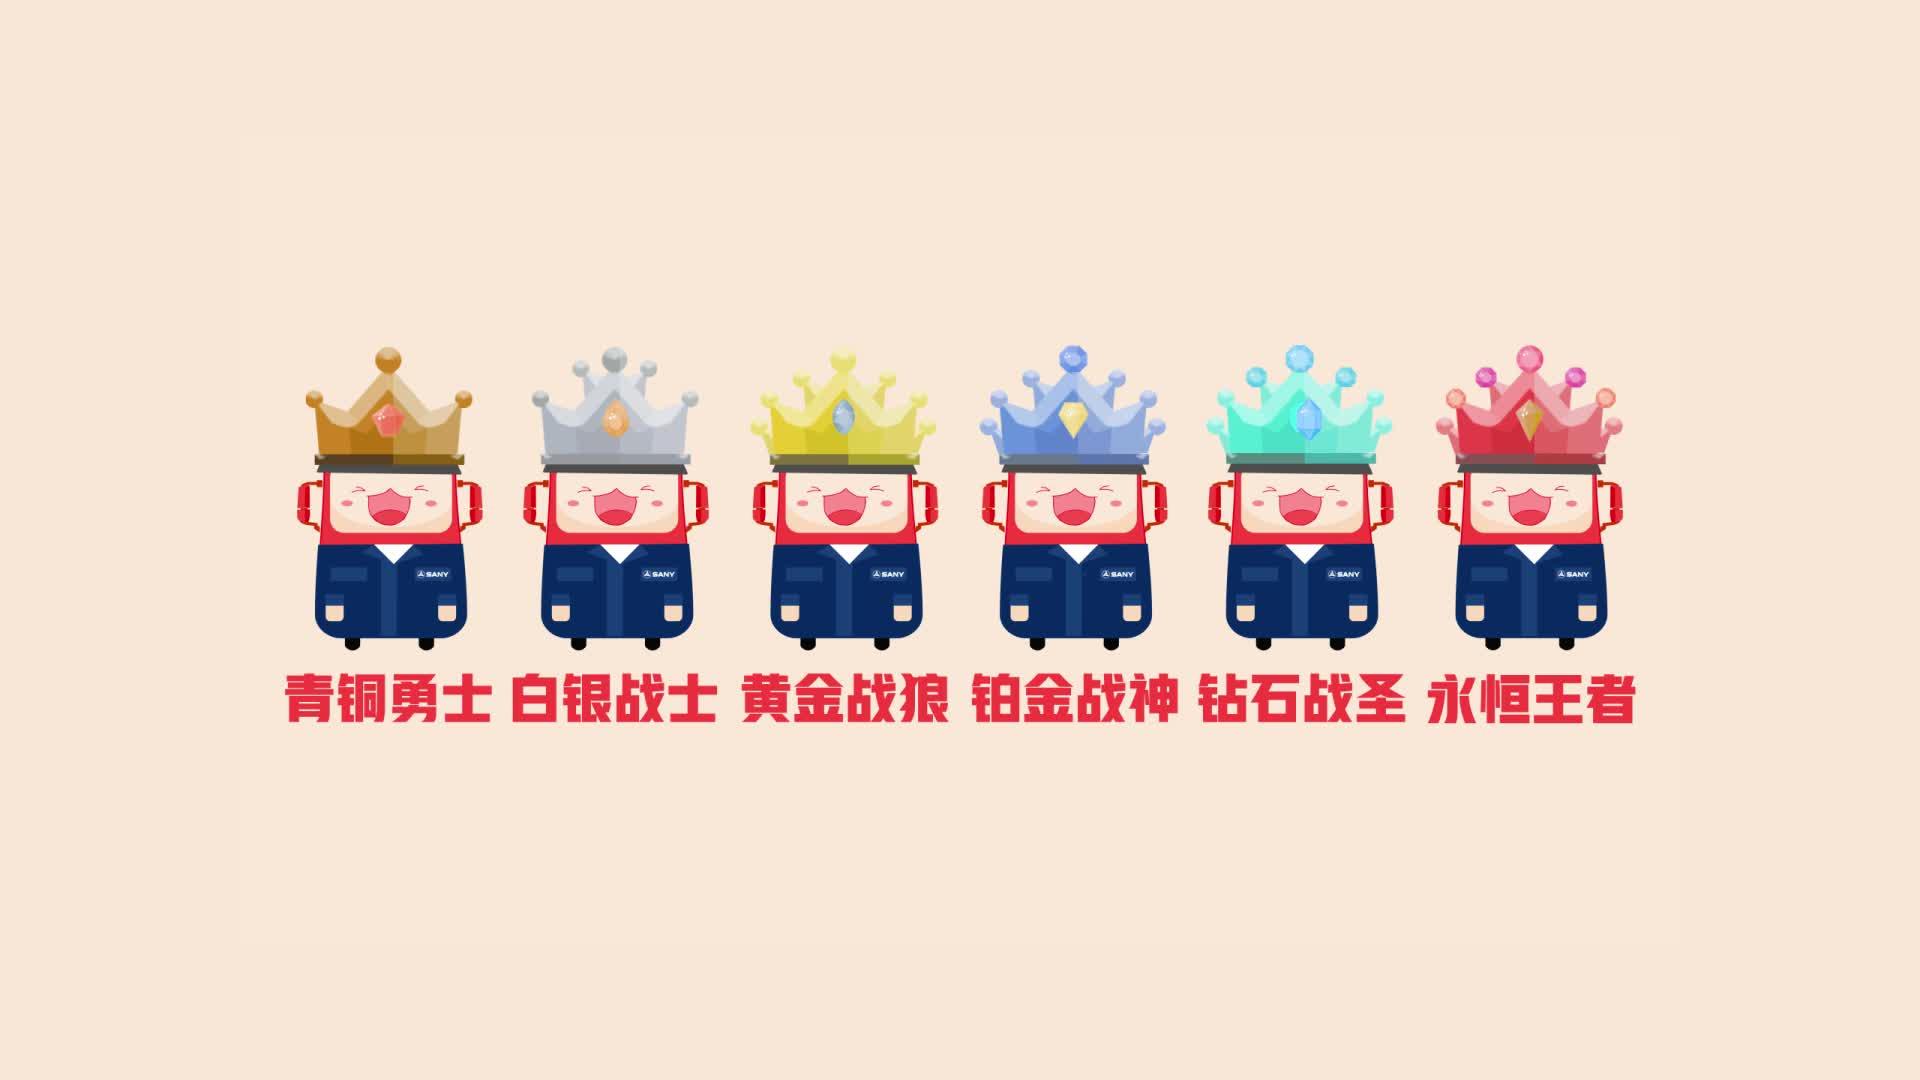 "ca88亚洲城娱乐重卡全民经纪人""卡迷"""